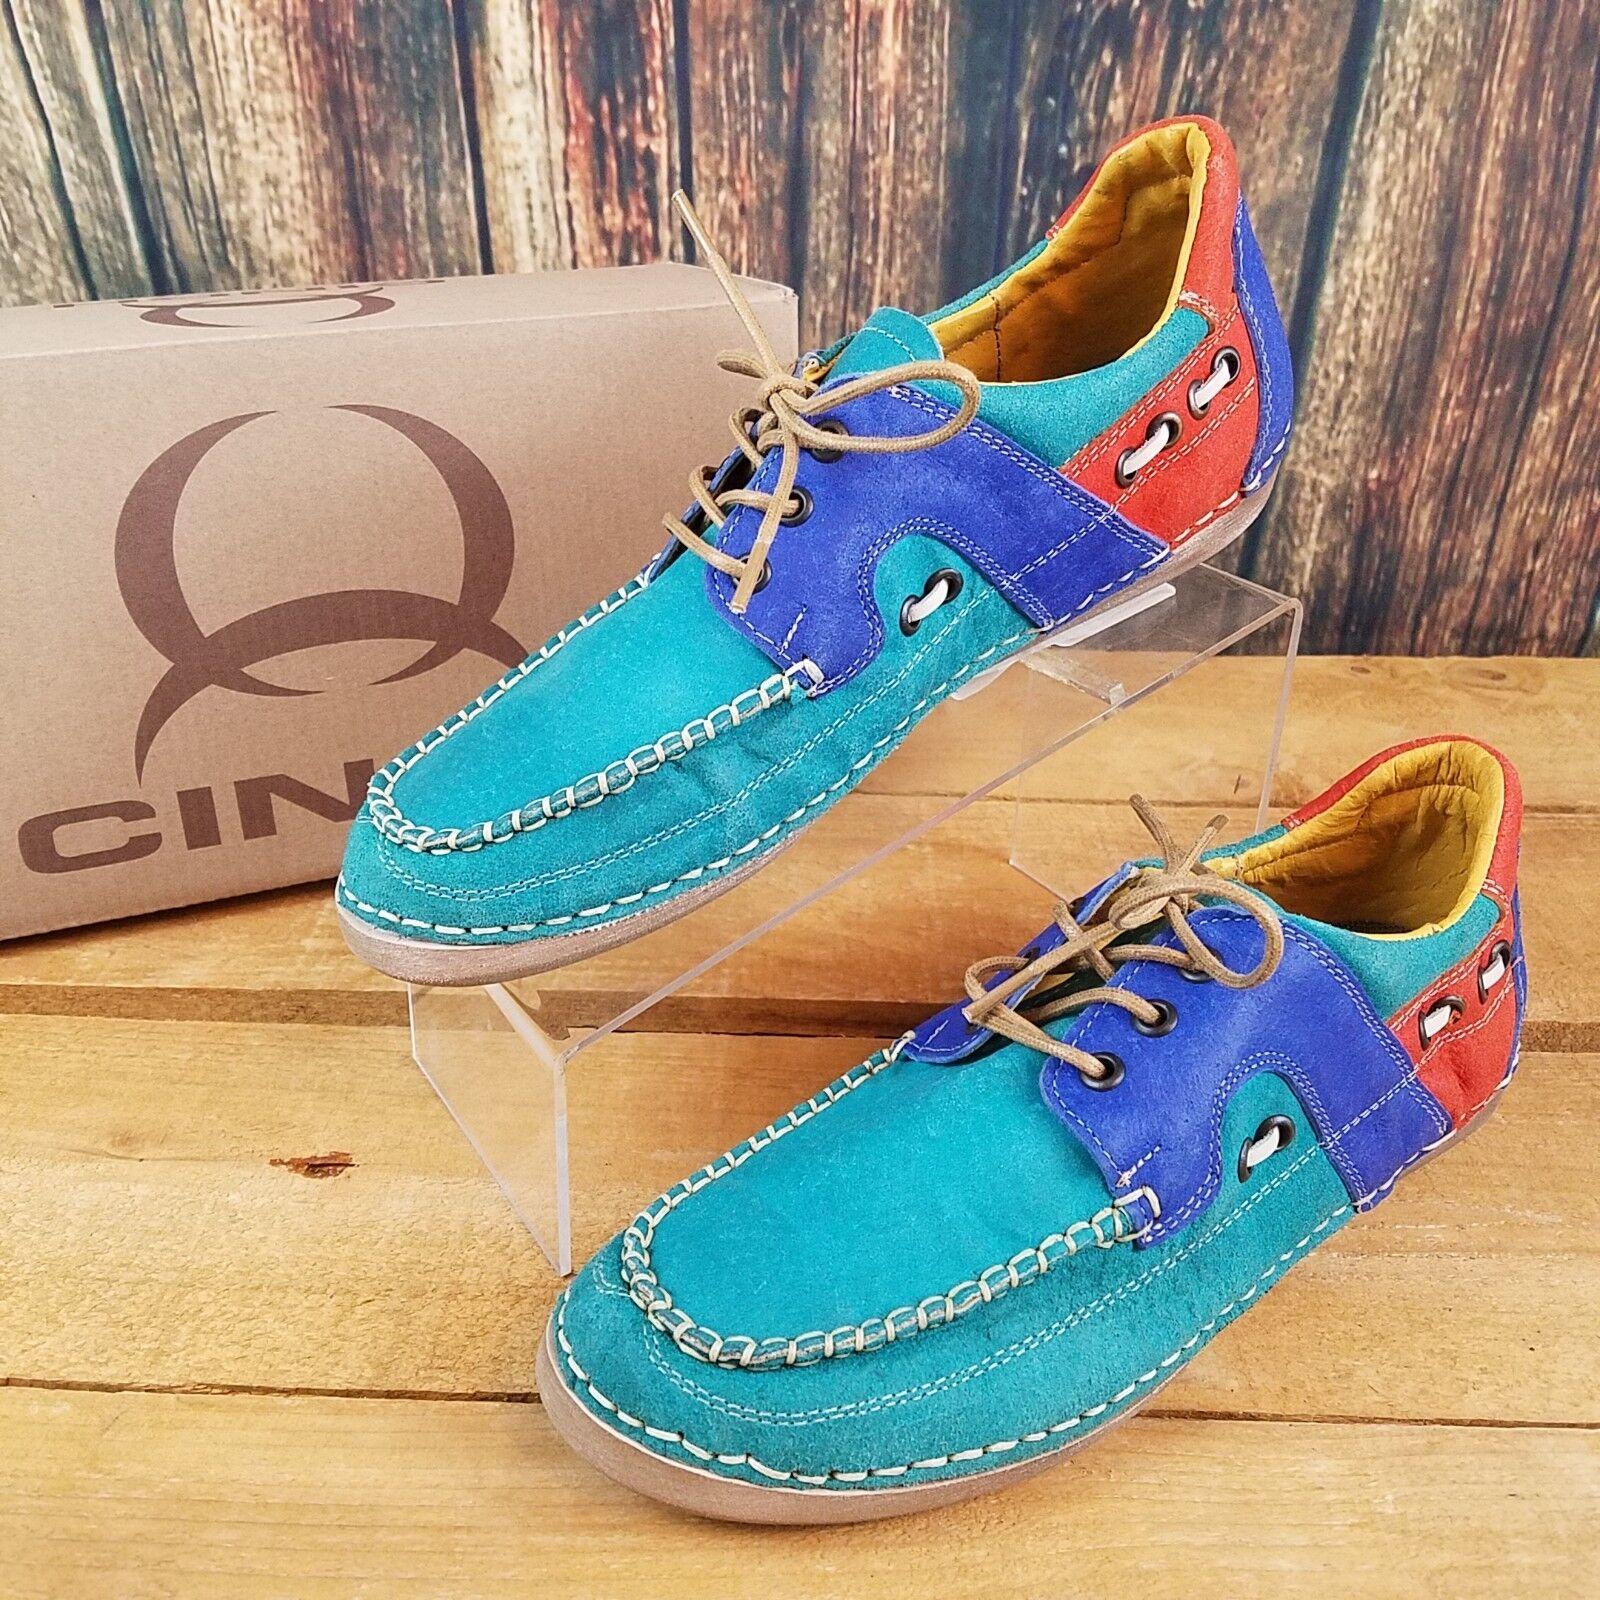 Cinch CCW3017 pour femme MultiCouleure Turquoise Chaussures Bateau Taille 6.5